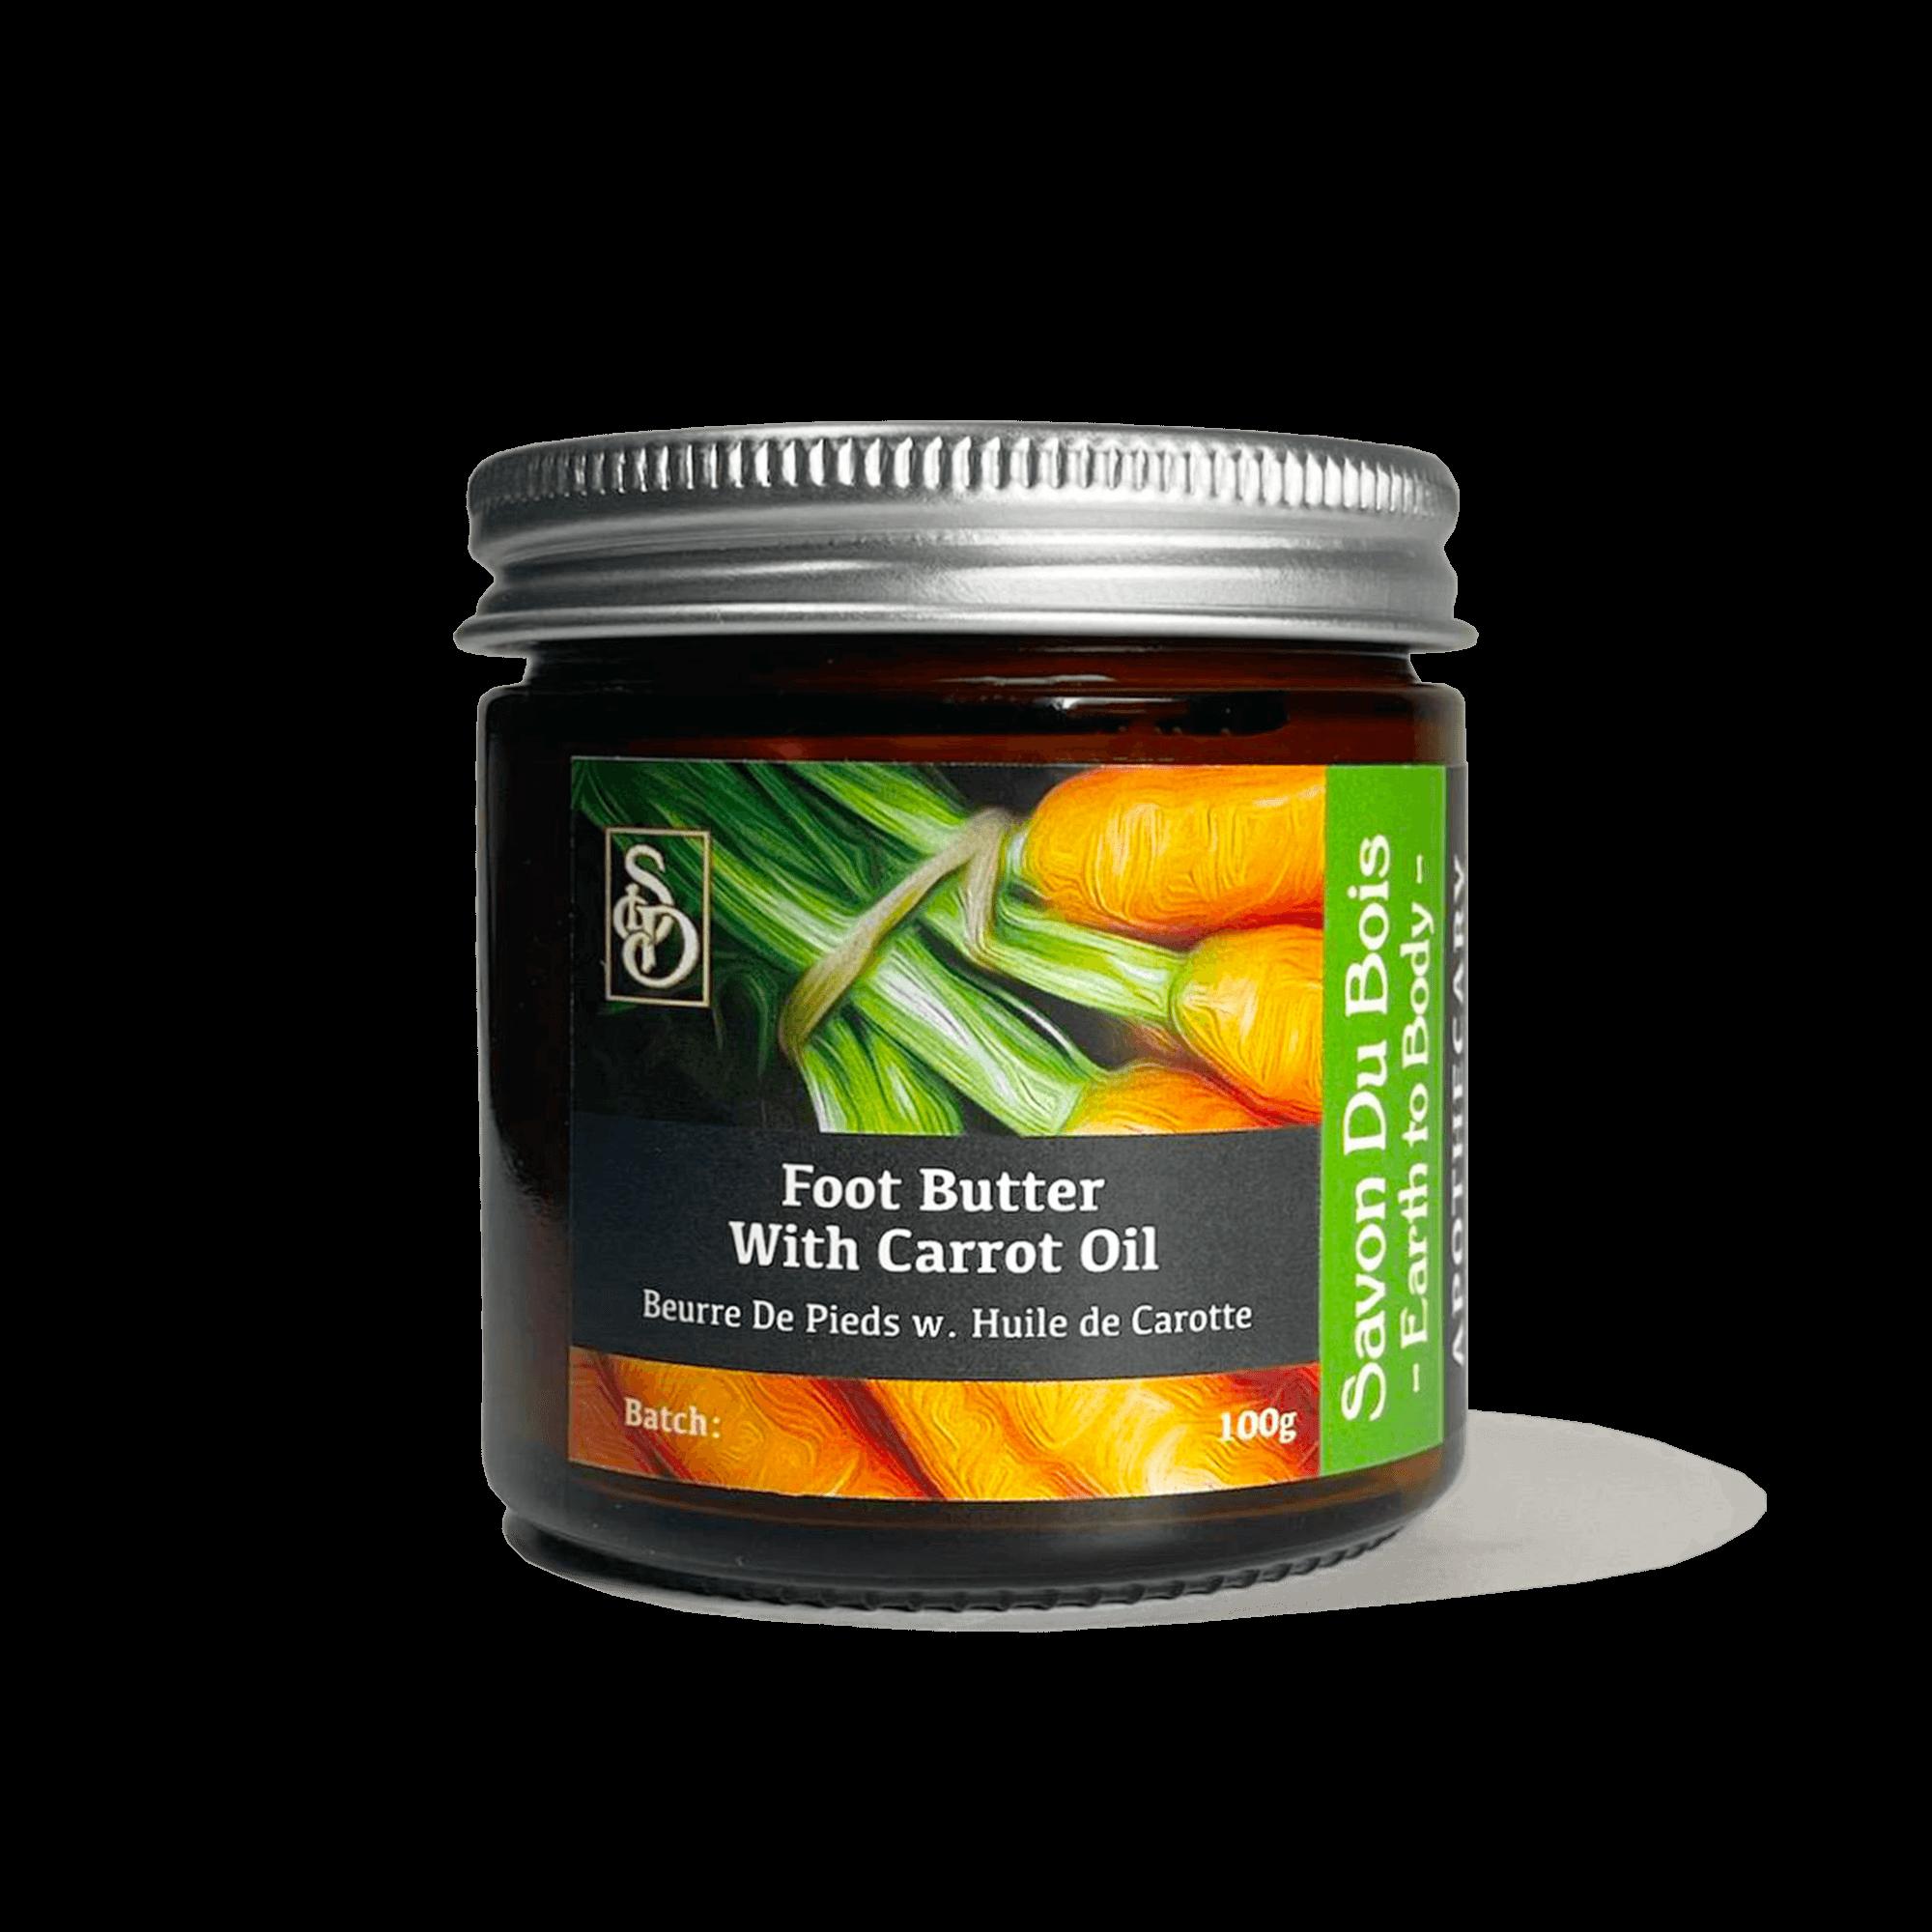 Whipped Foot Butter | Carrot Oil